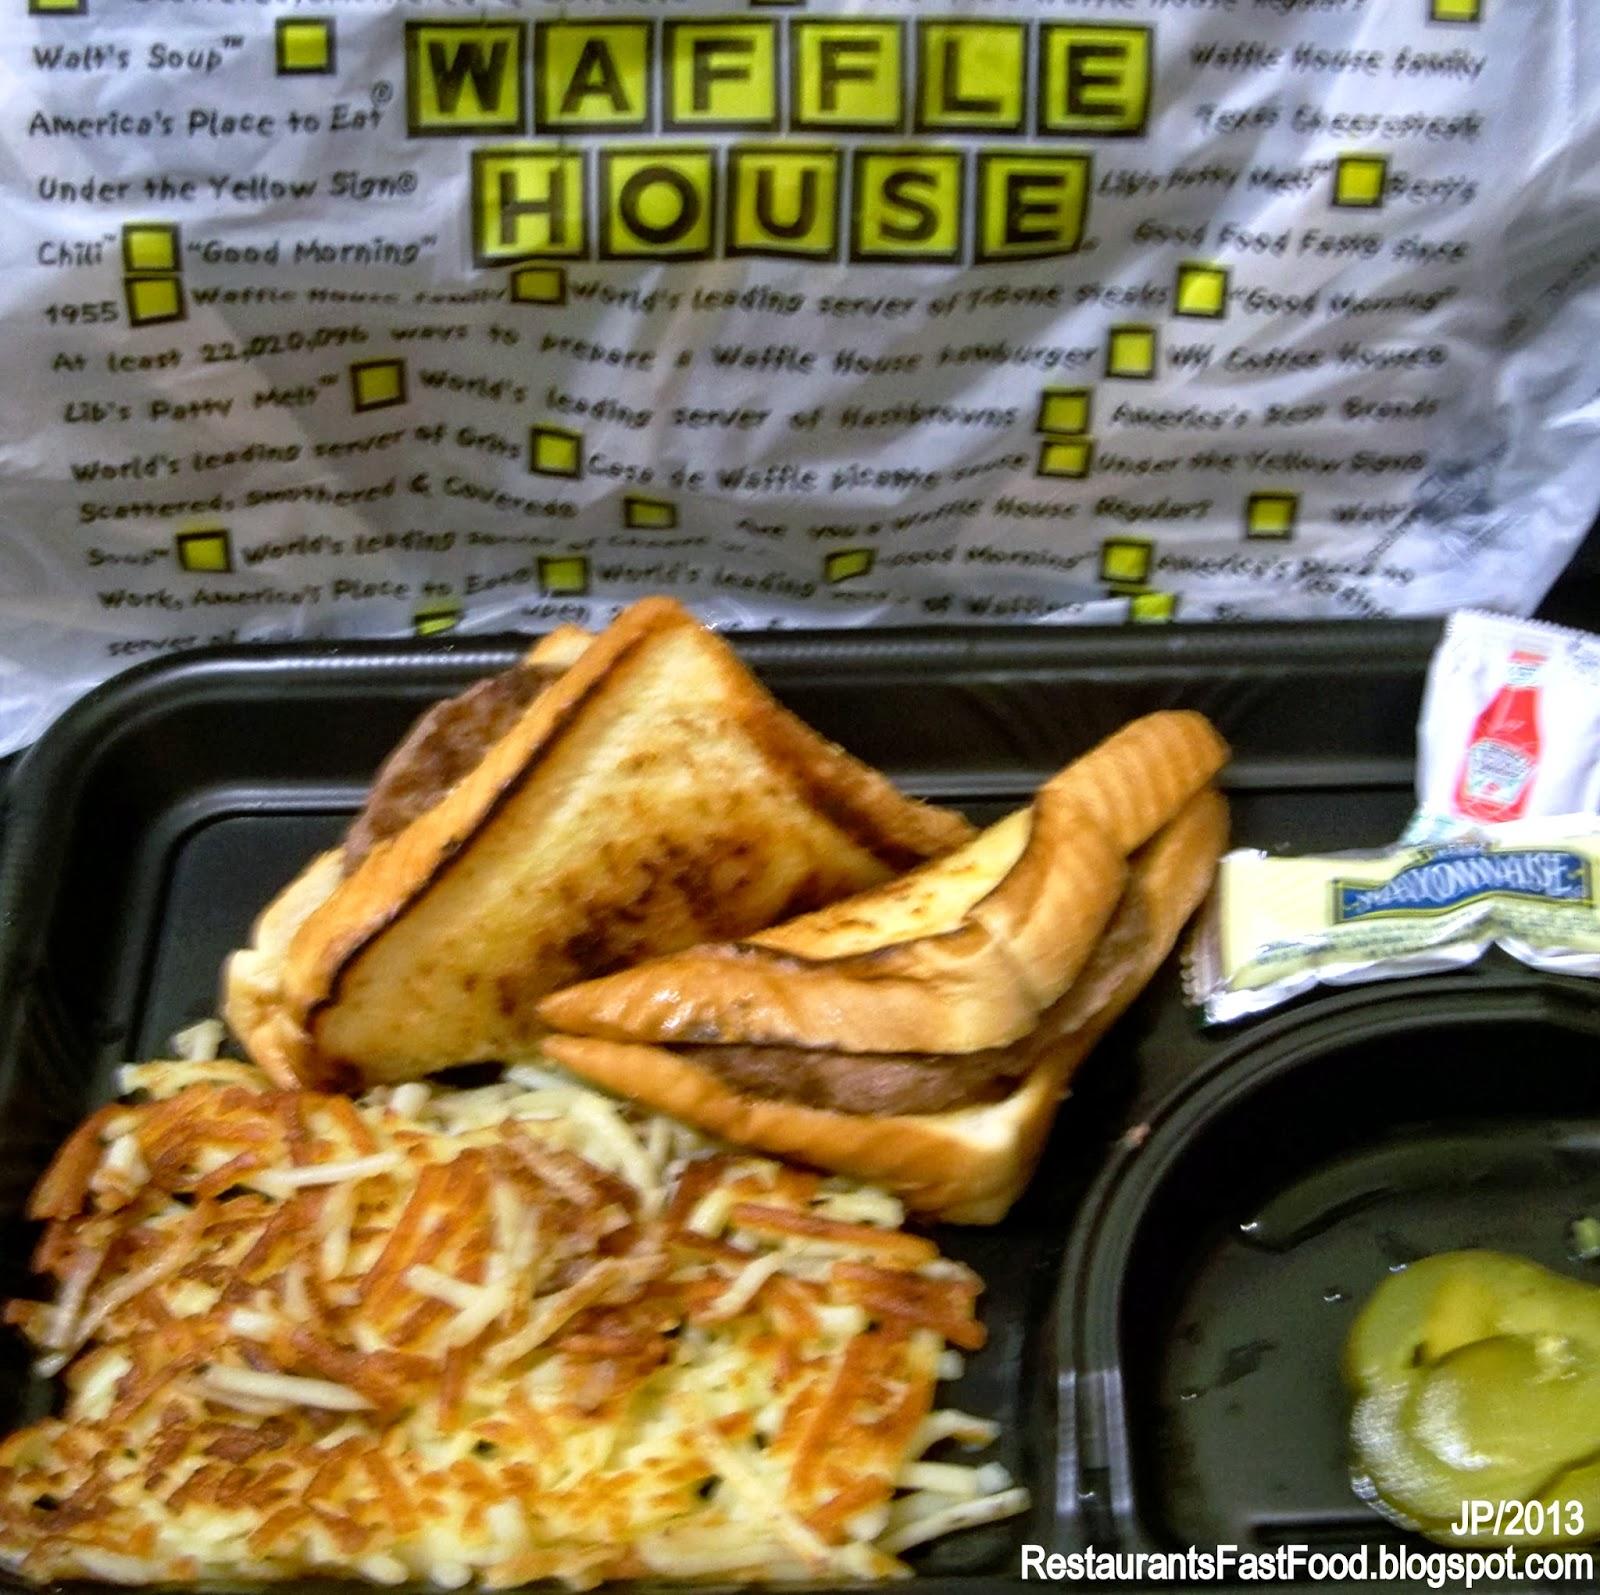 Waffle House 5 Dollar Menu degreesdesign